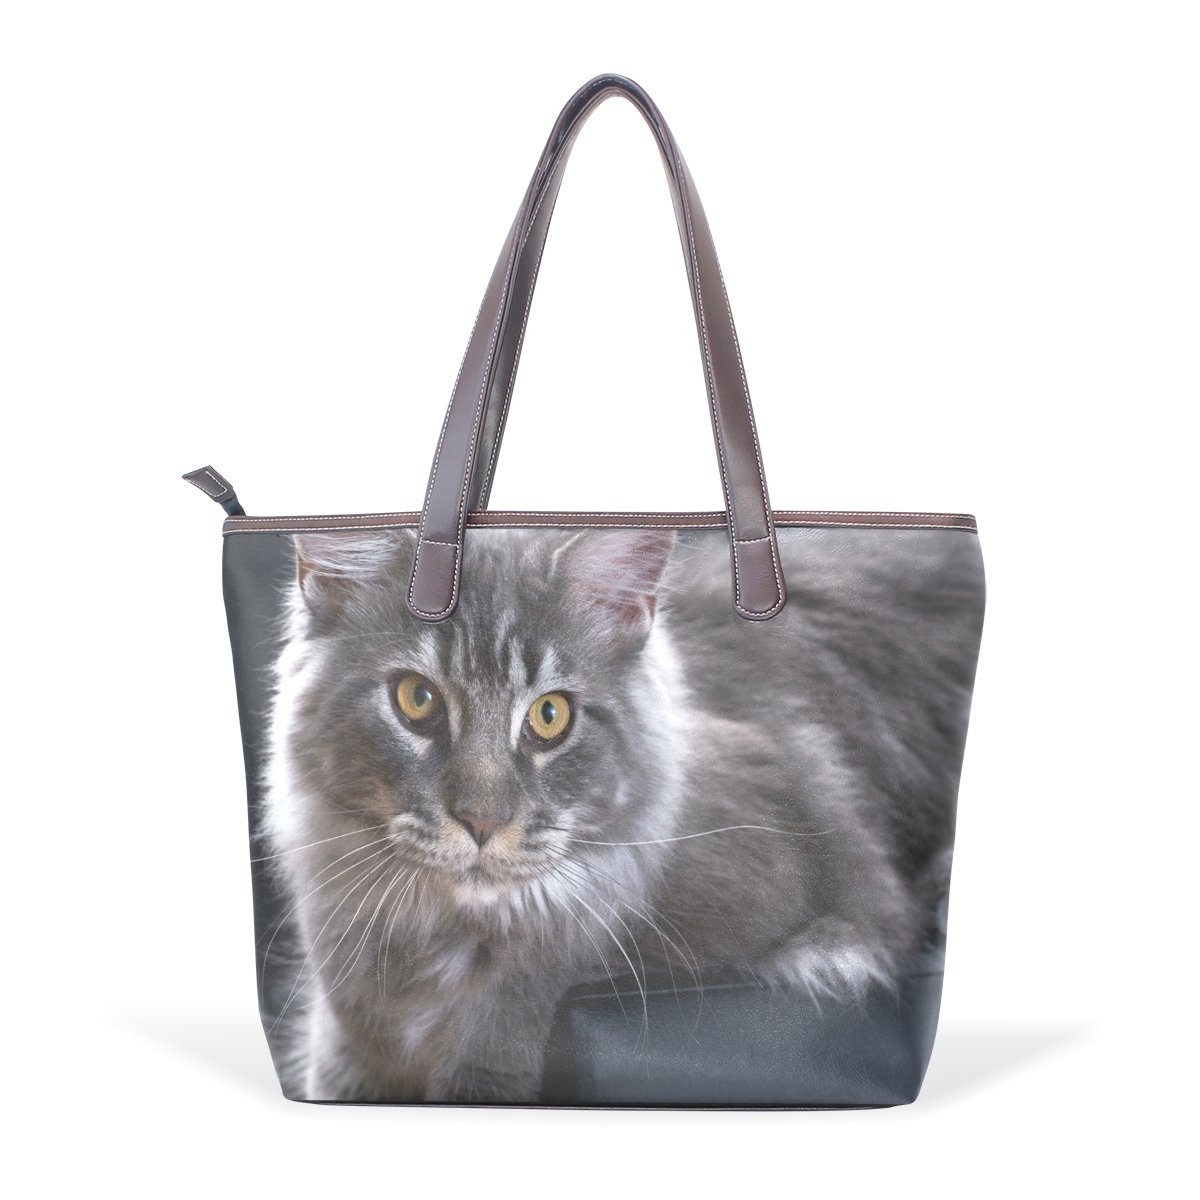 SCDS Abstract The Cat PU Leather Lady Handbag Tote Bag Zipper Shoulder Bag